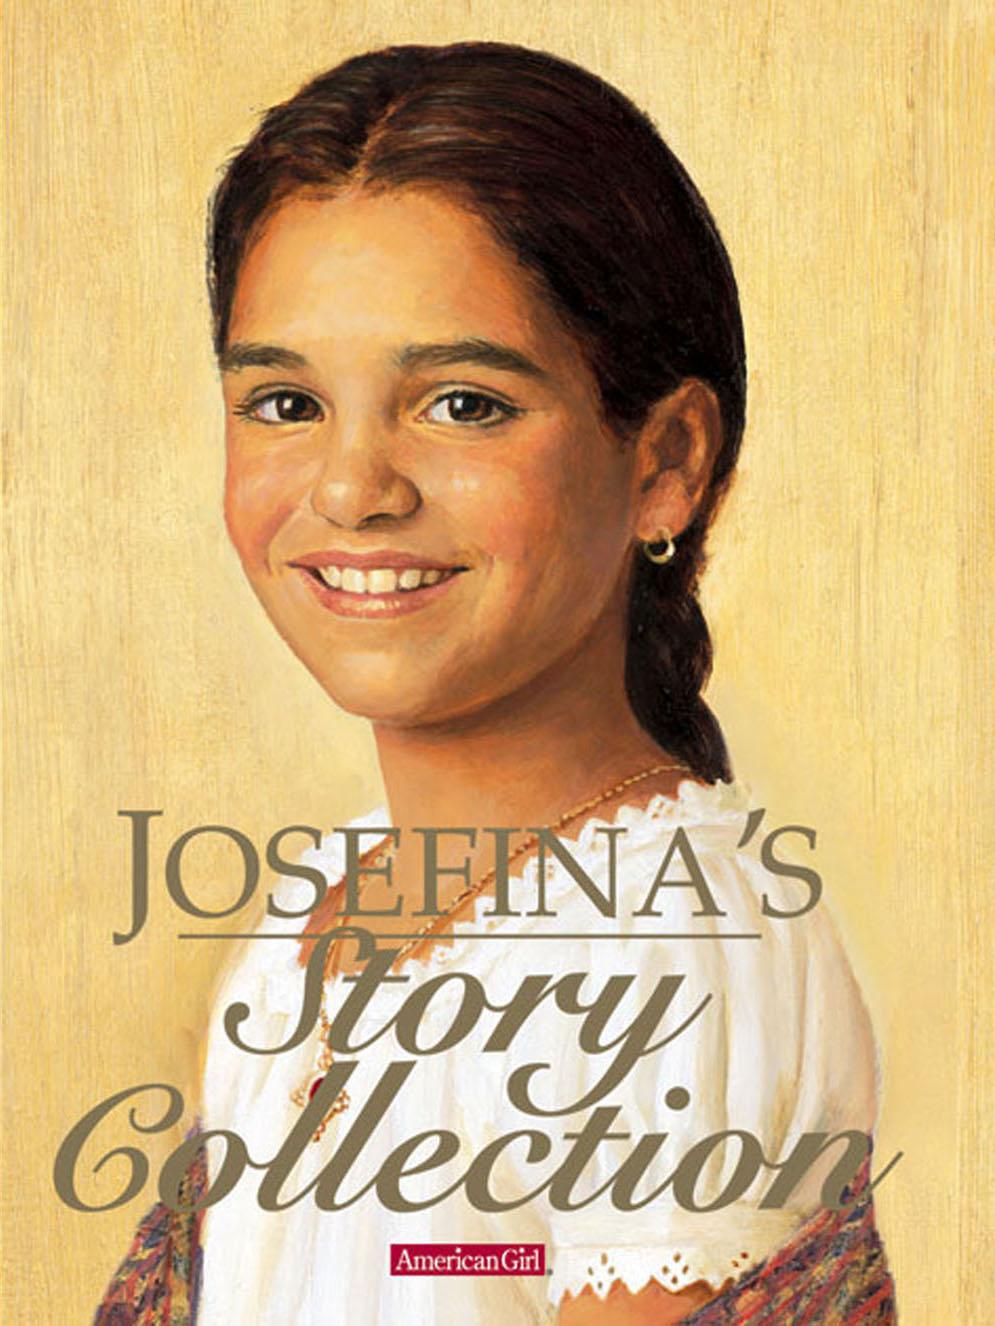 Josefina's Story Collection I